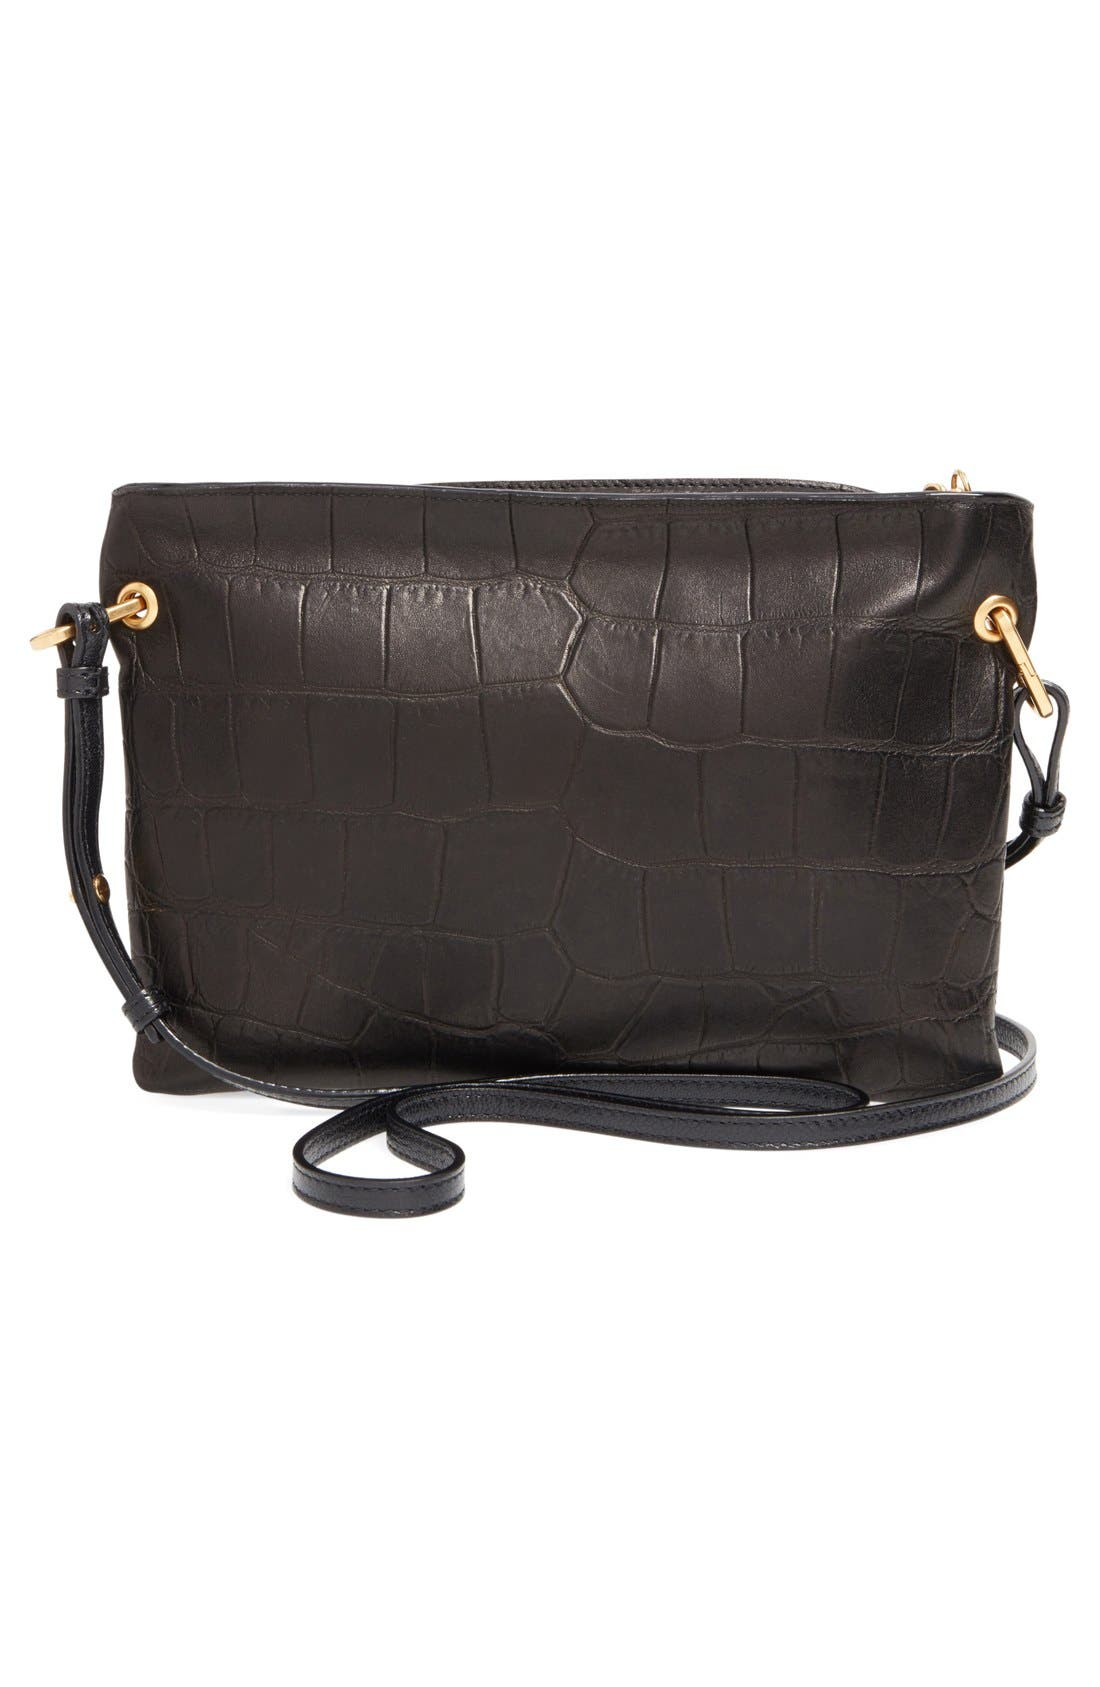 Alternate Image 3  - Jimmy Choo 'Mardy' Croc Embossed Leather Crossbody Bag